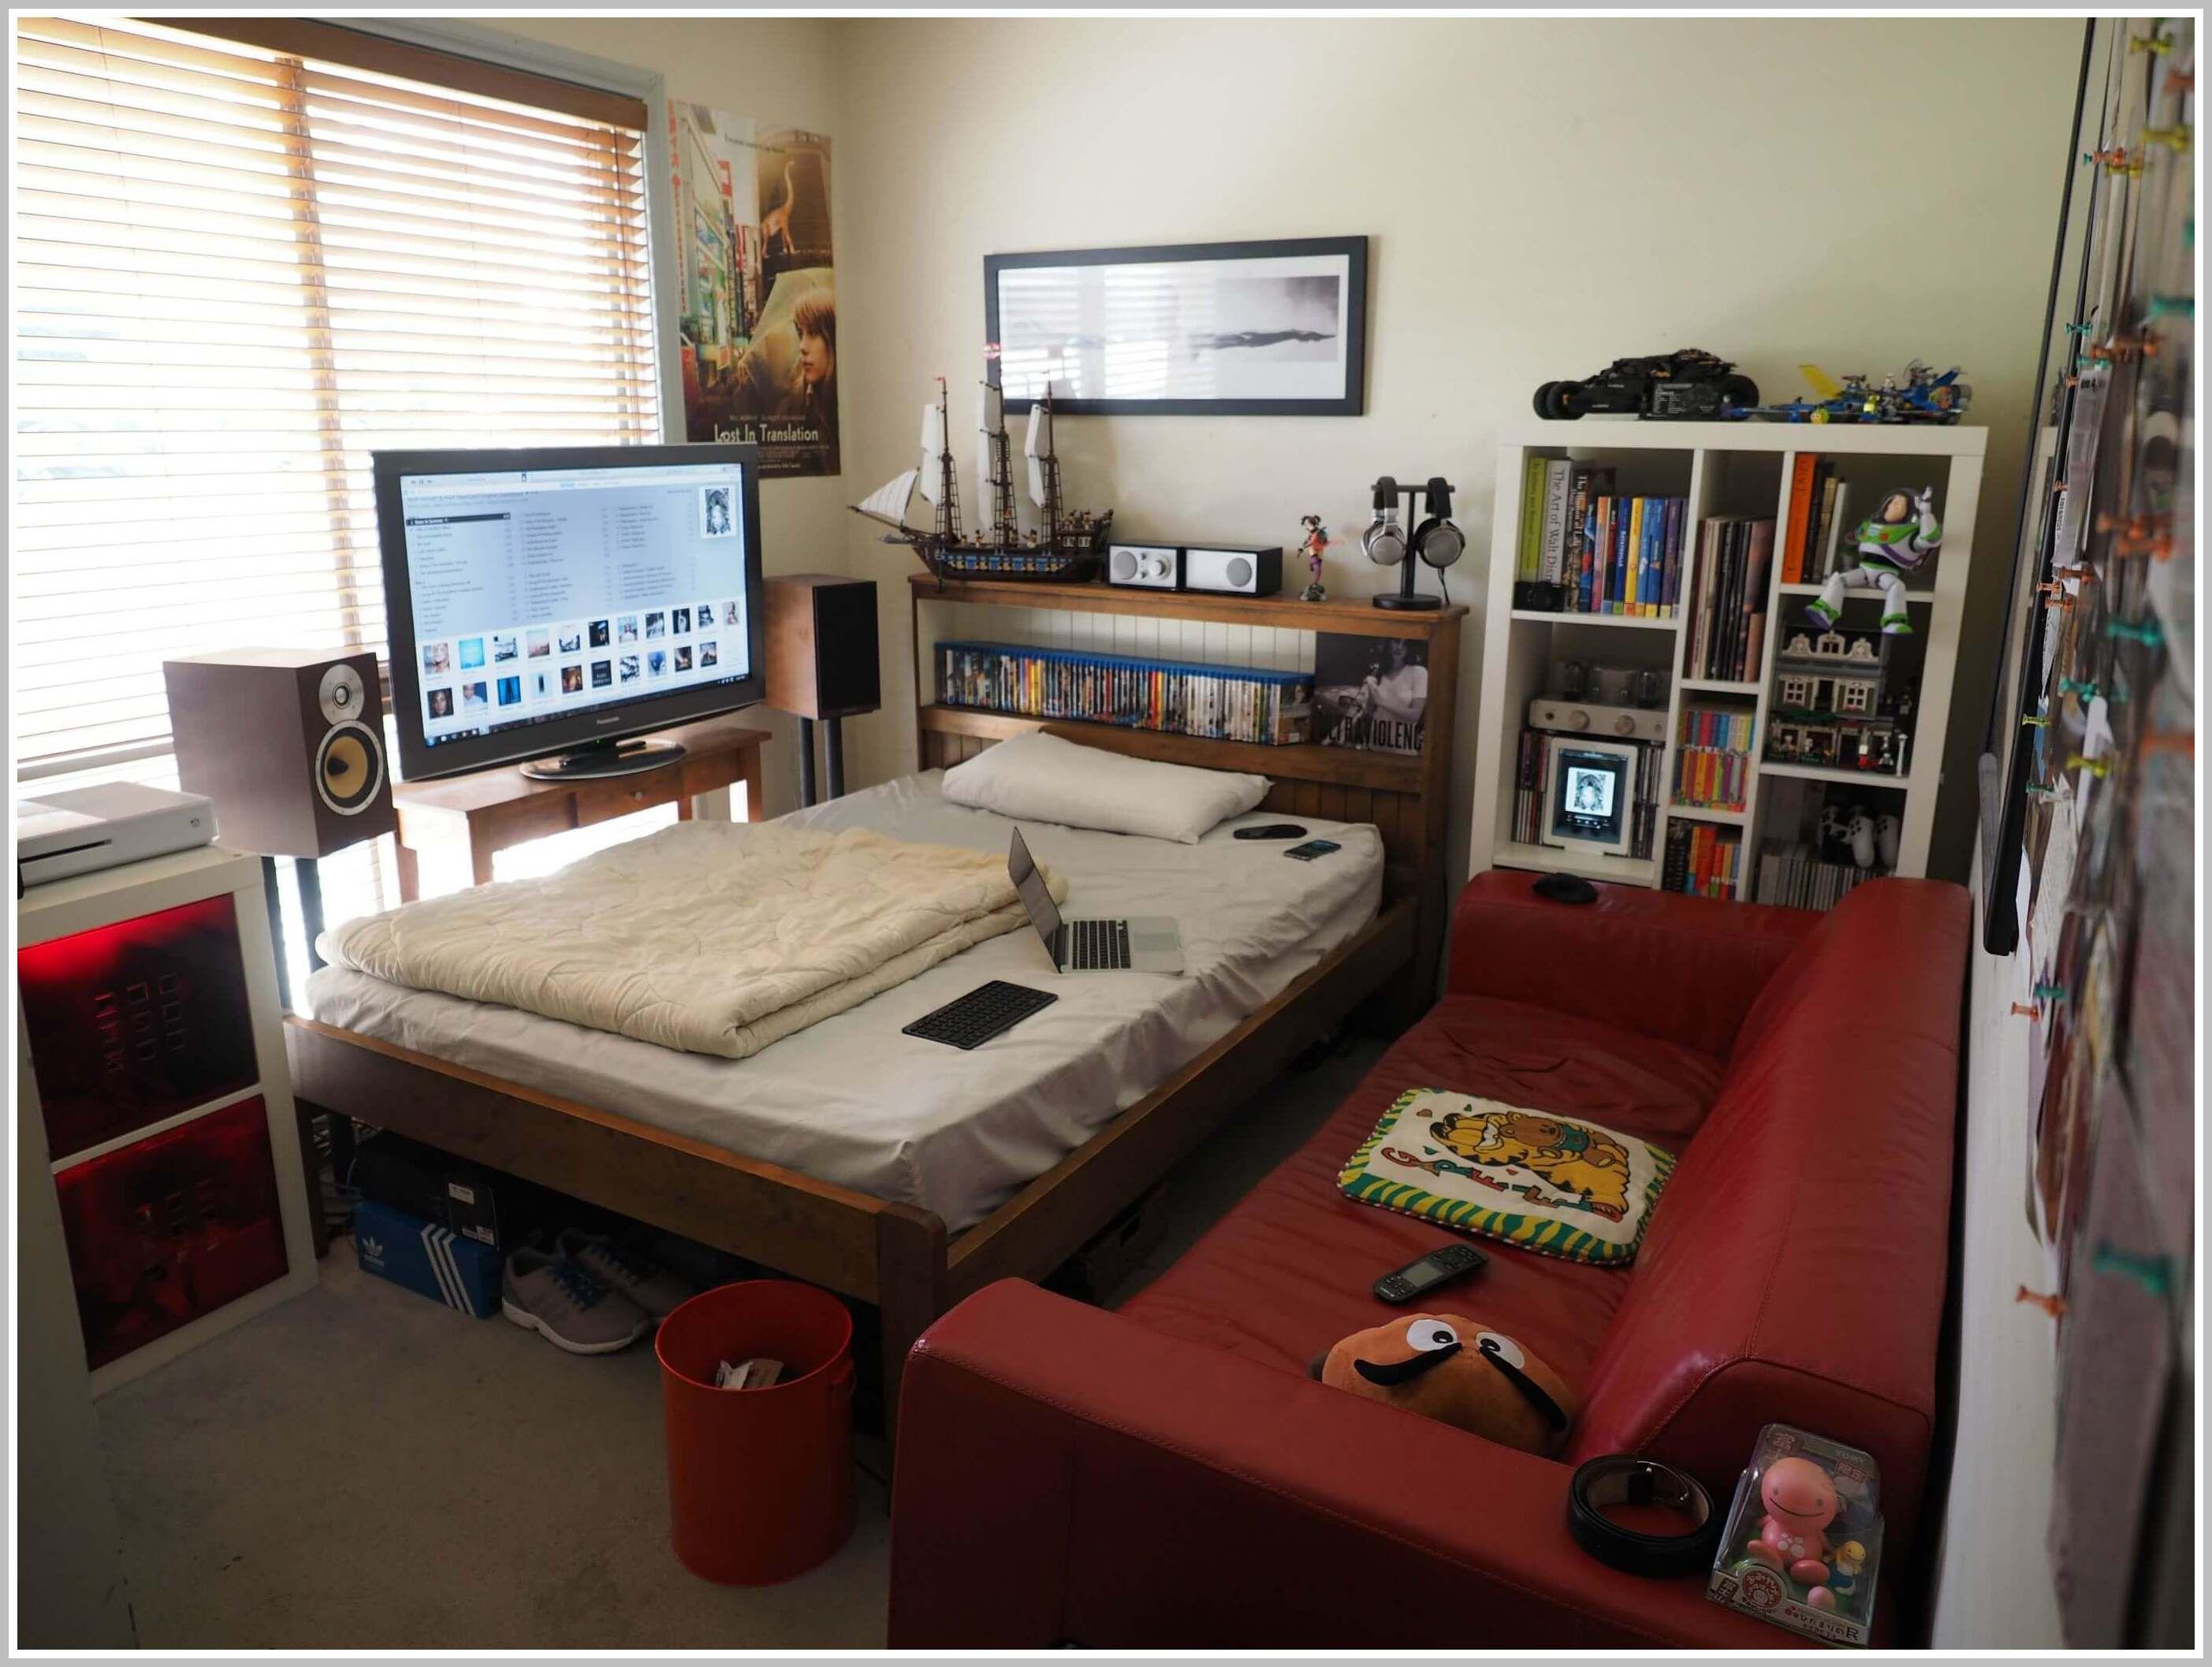 47 Reference Of Game Room Ideas Cheap In 2020 Bedroom Setup Game Room Decor Dorm Room Setup